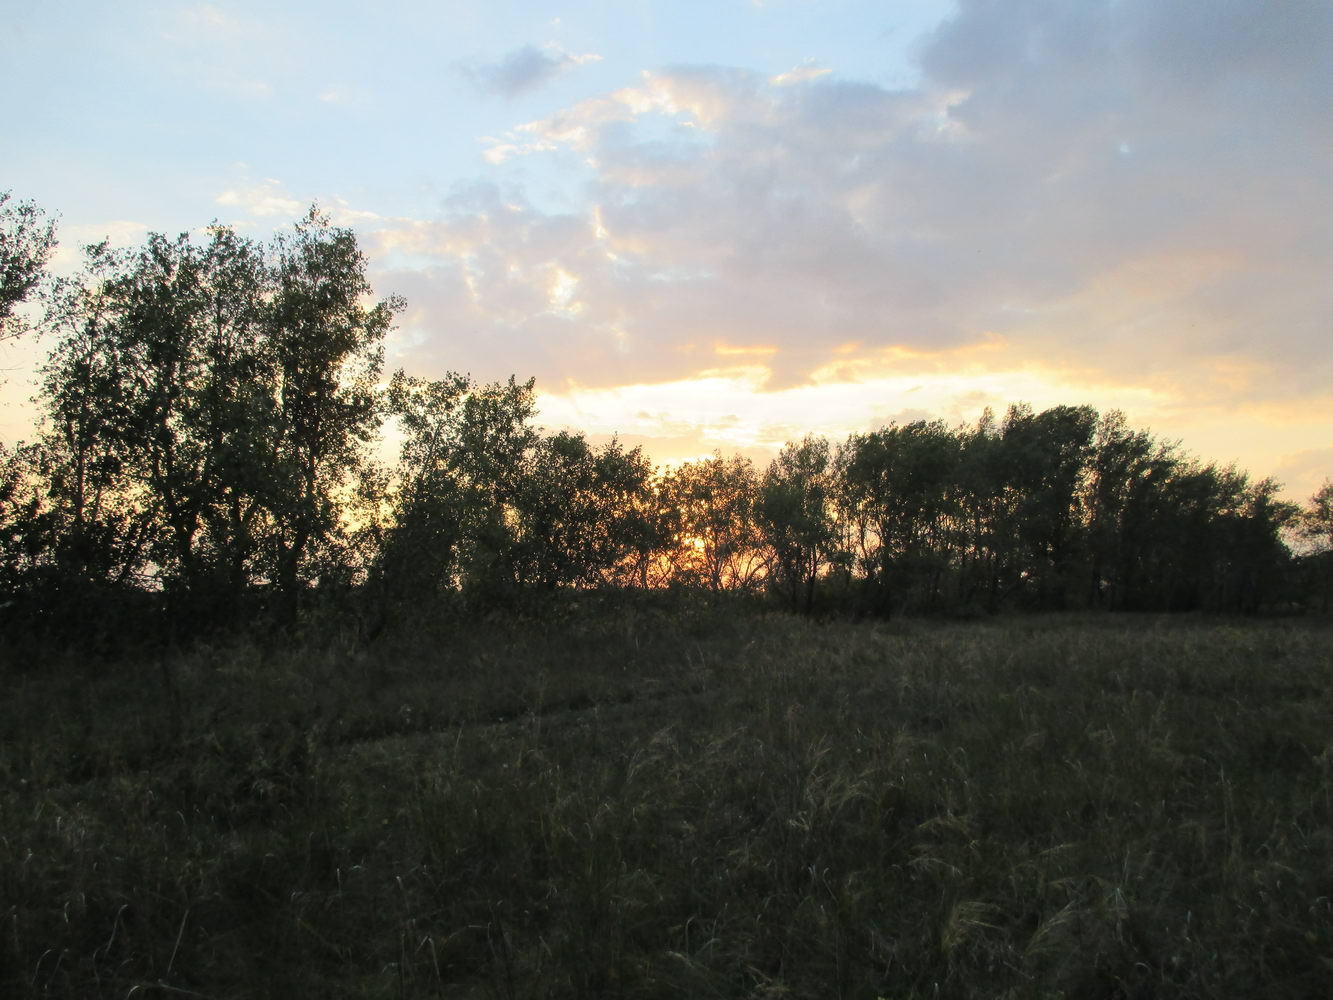 красивый закат, на фото не видно. природа. автостоп через сибирь